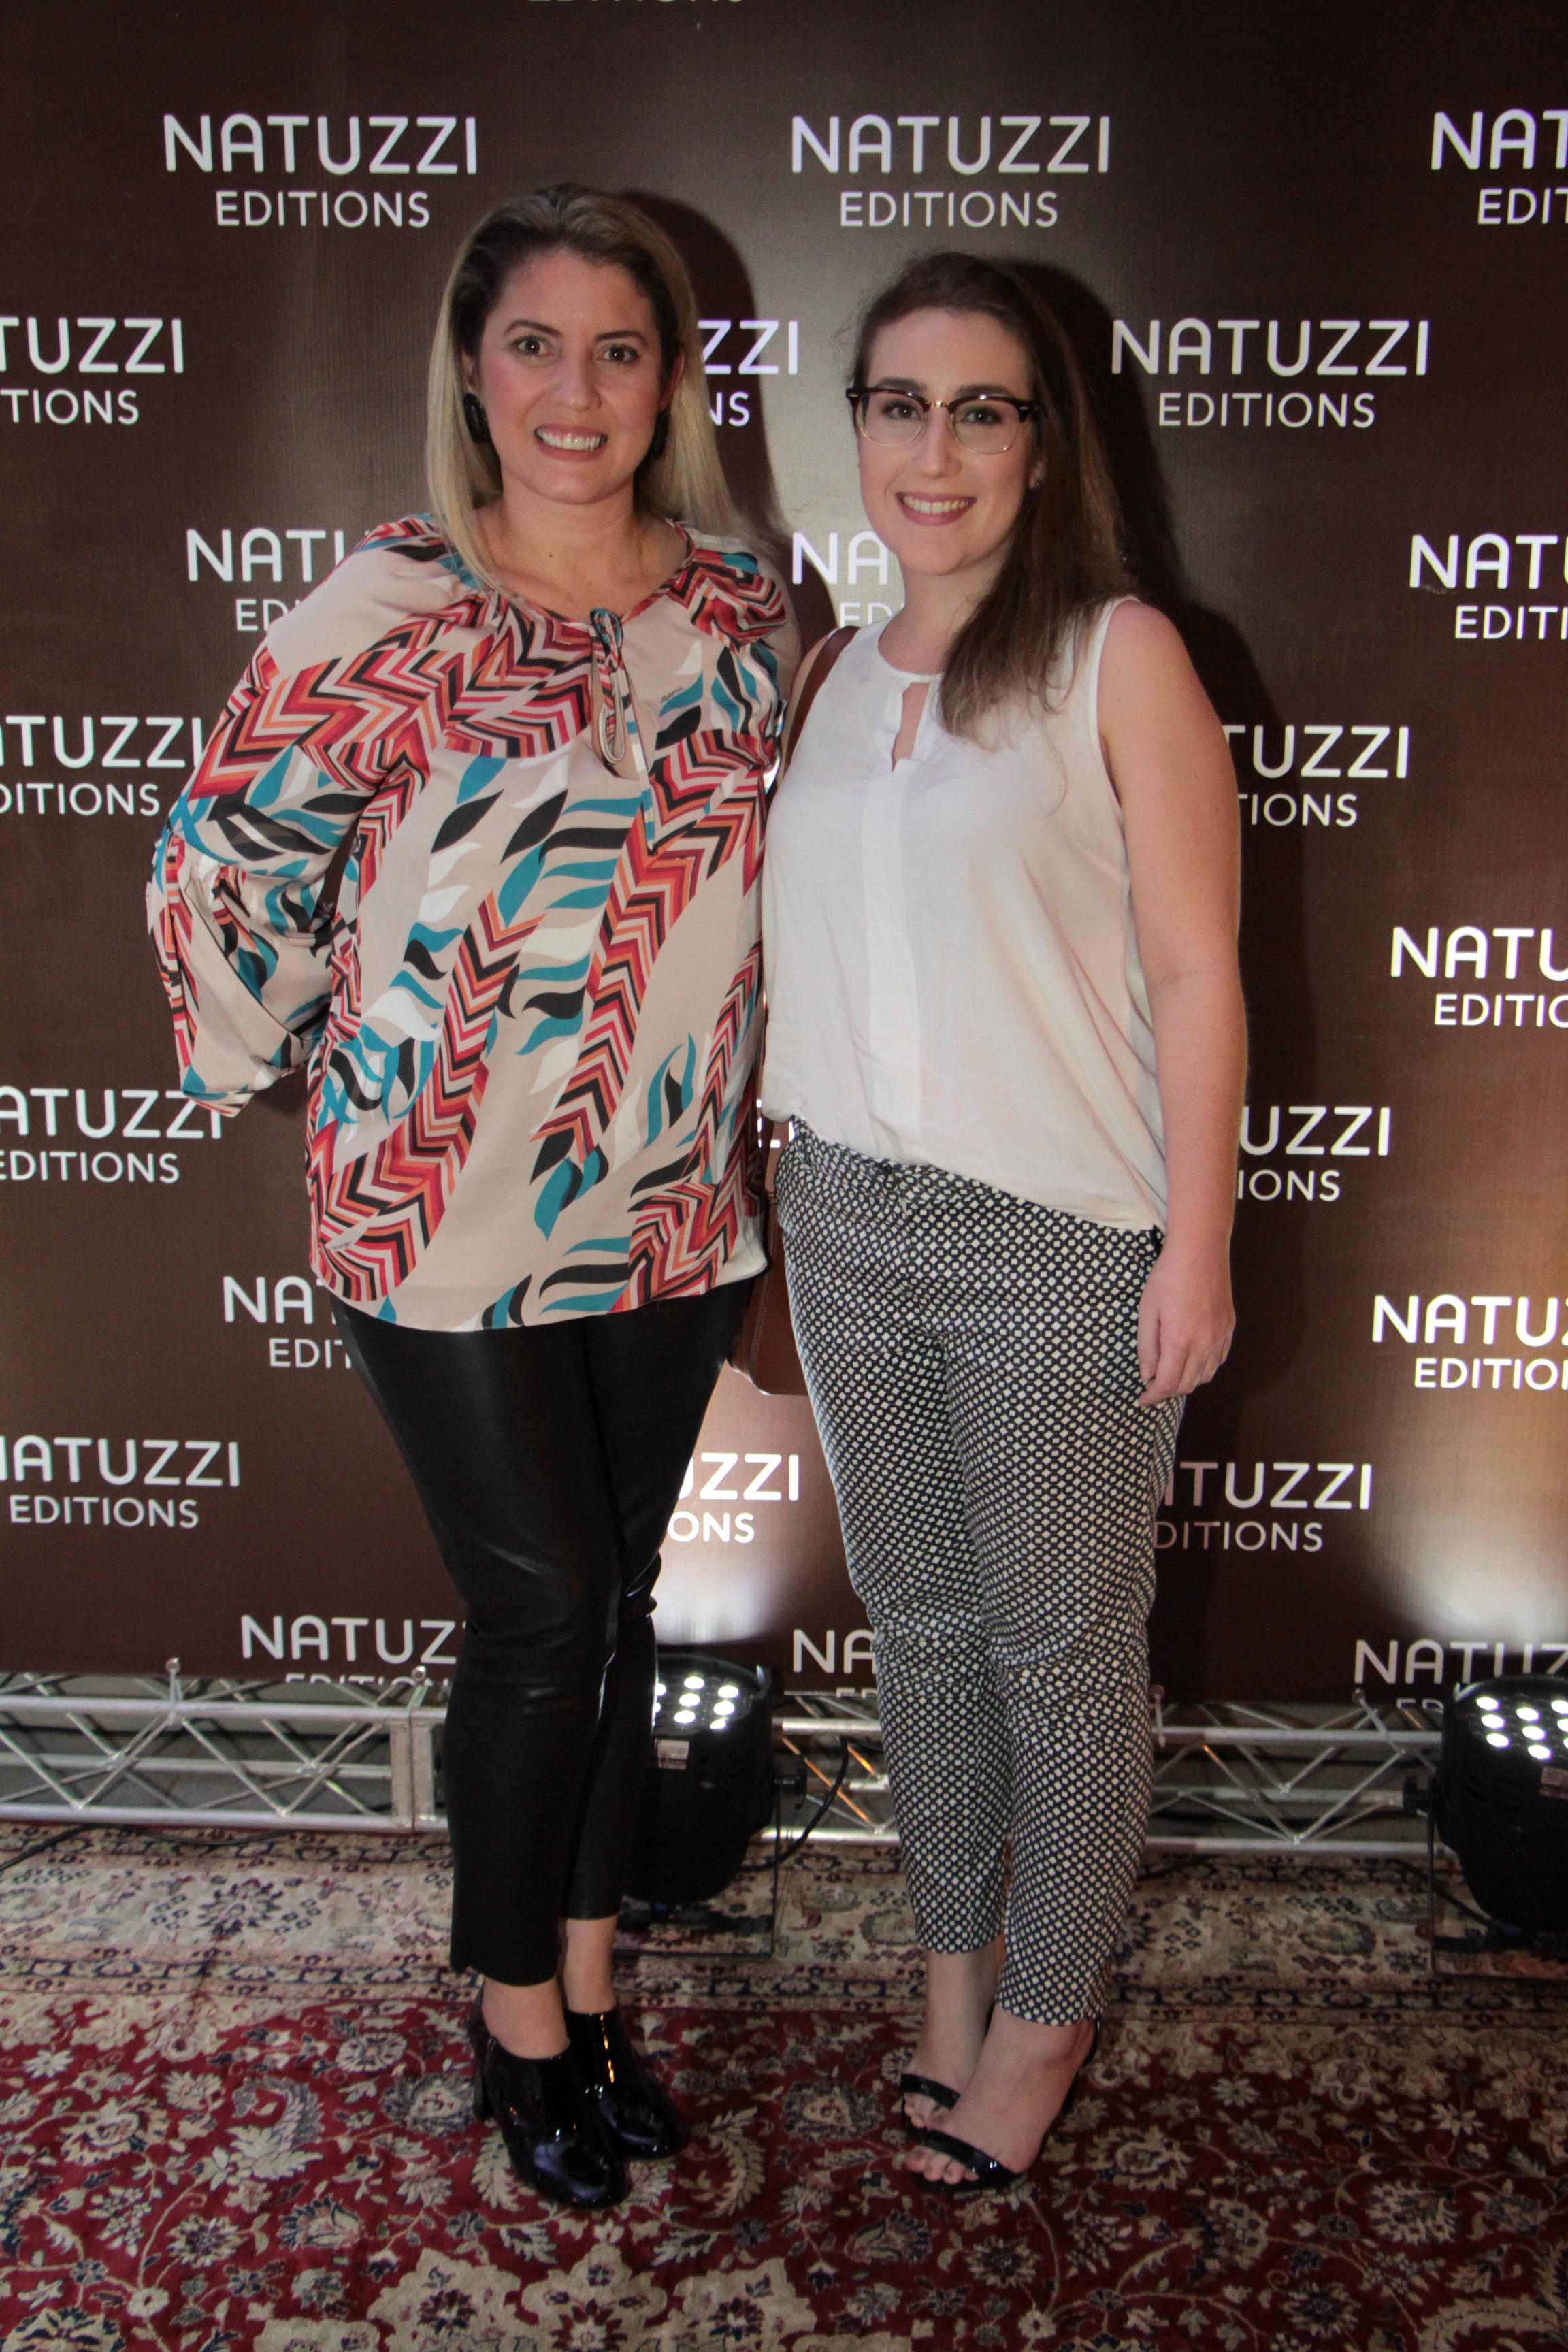 Natuzzi (70)-min.JPG